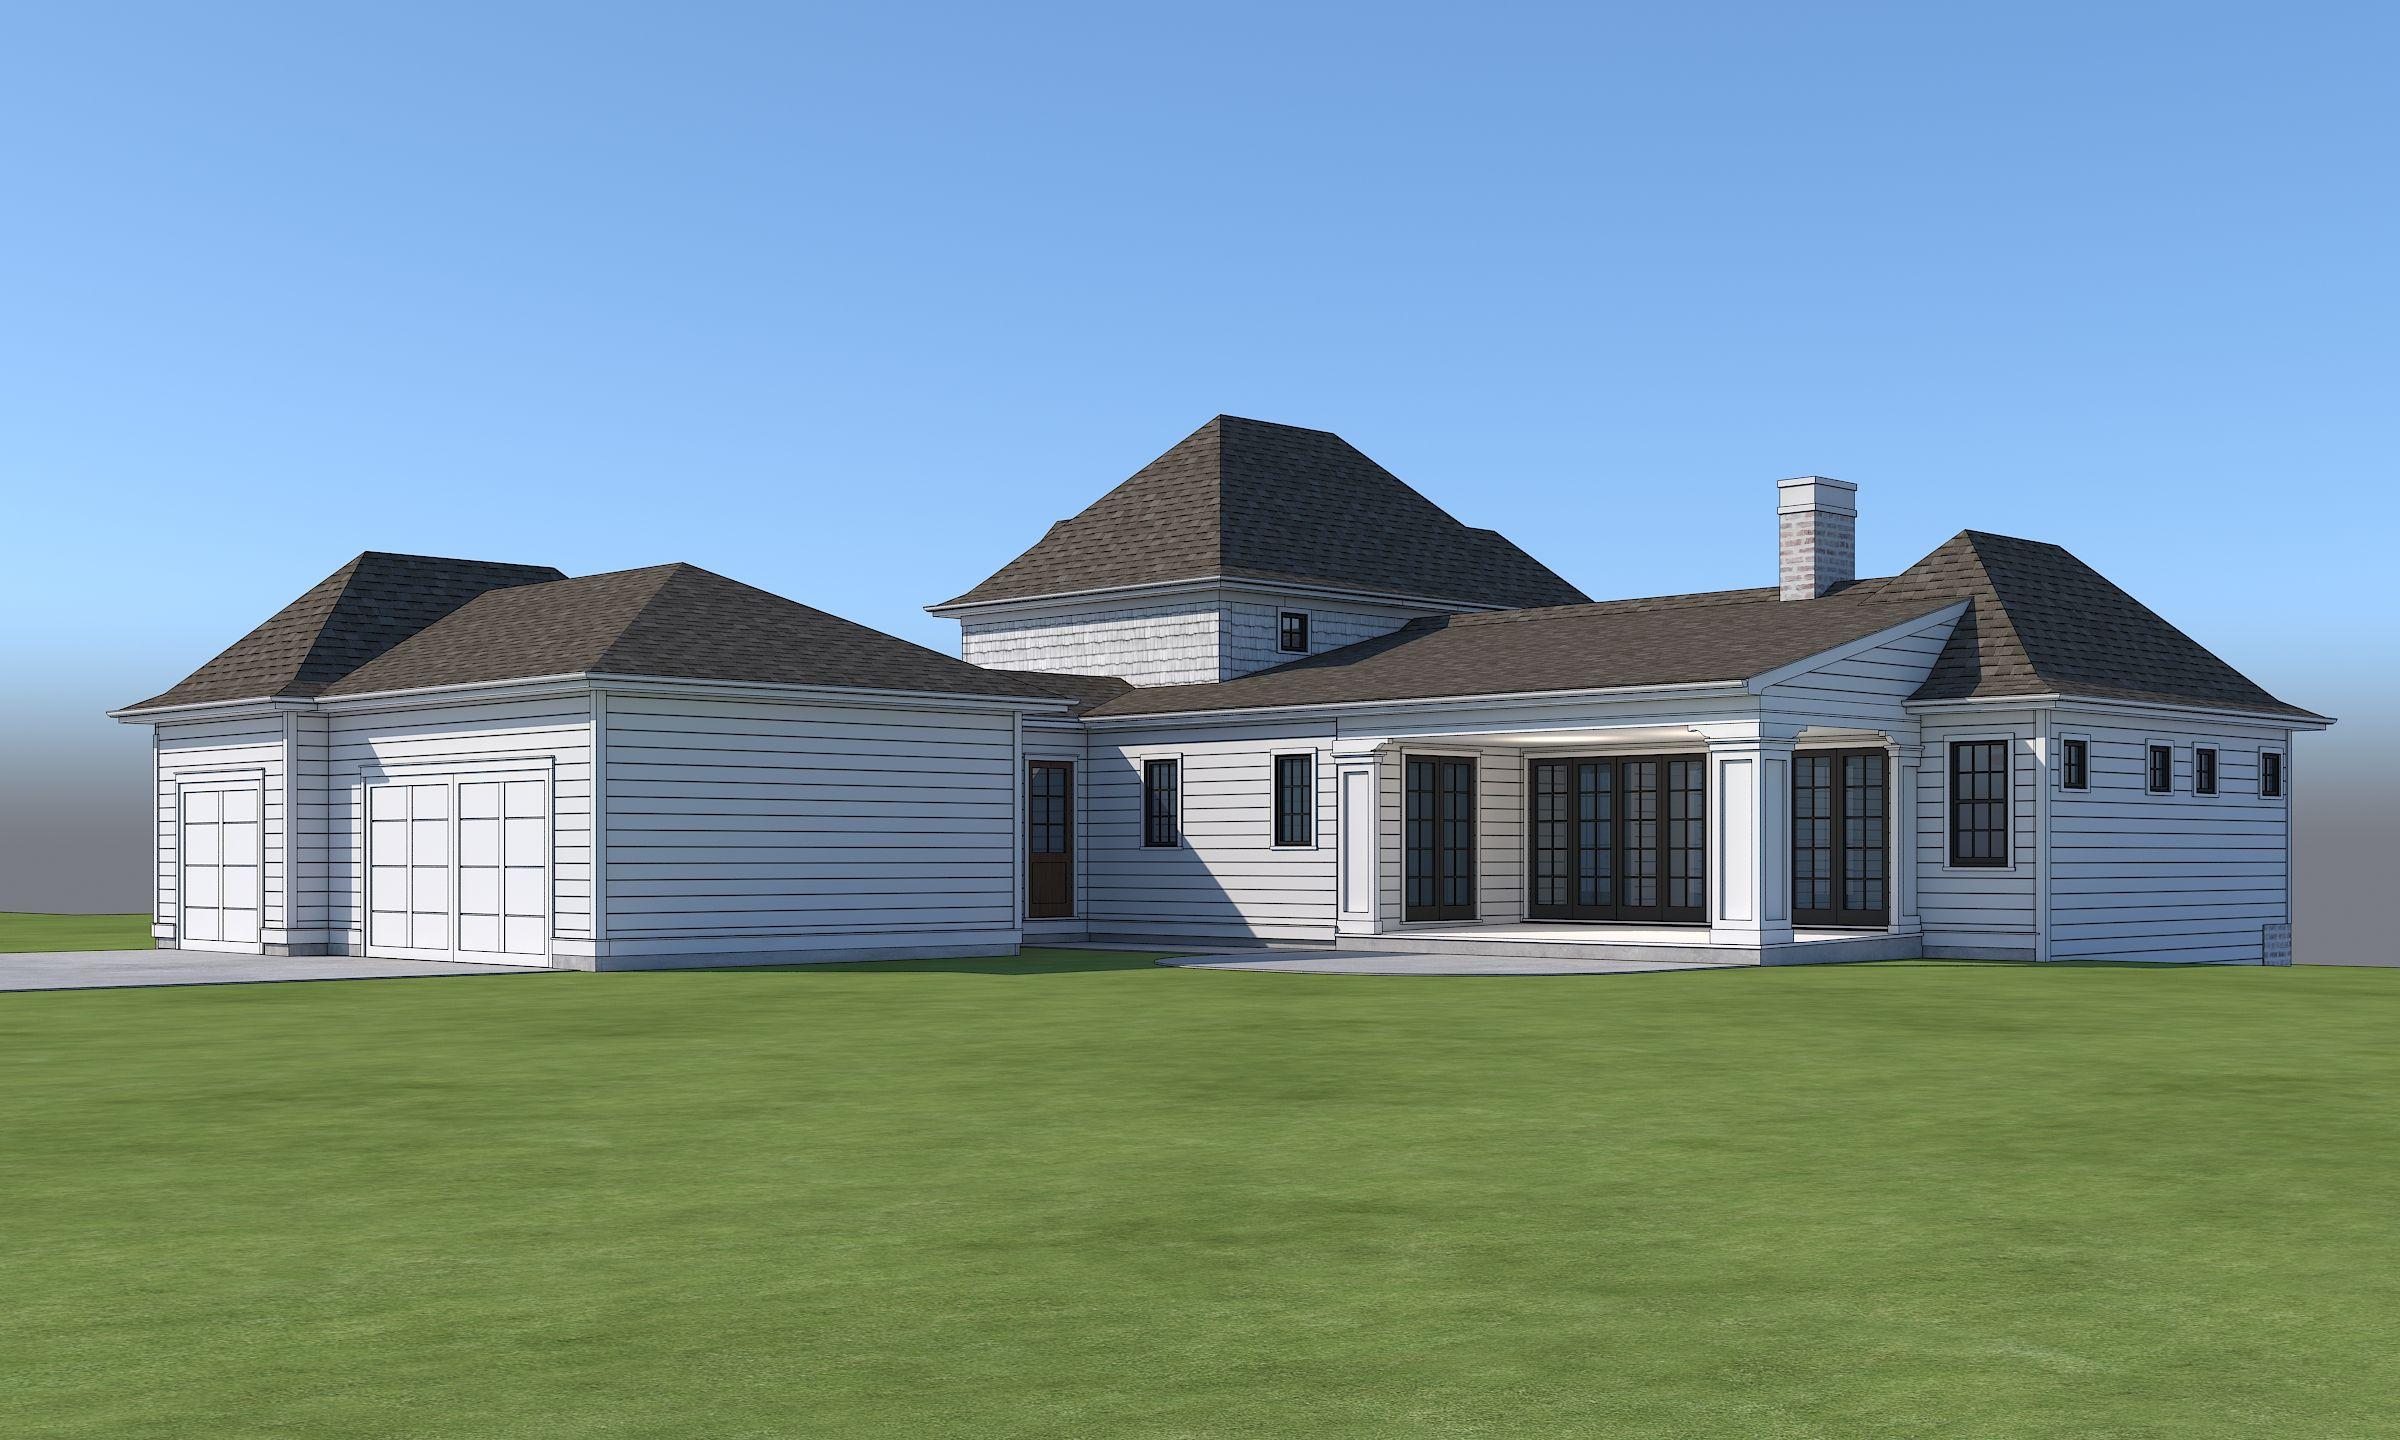 residential-warren-county-iowa-1-acres-listing-number-15524-1-2021-05-27-200847.jpg